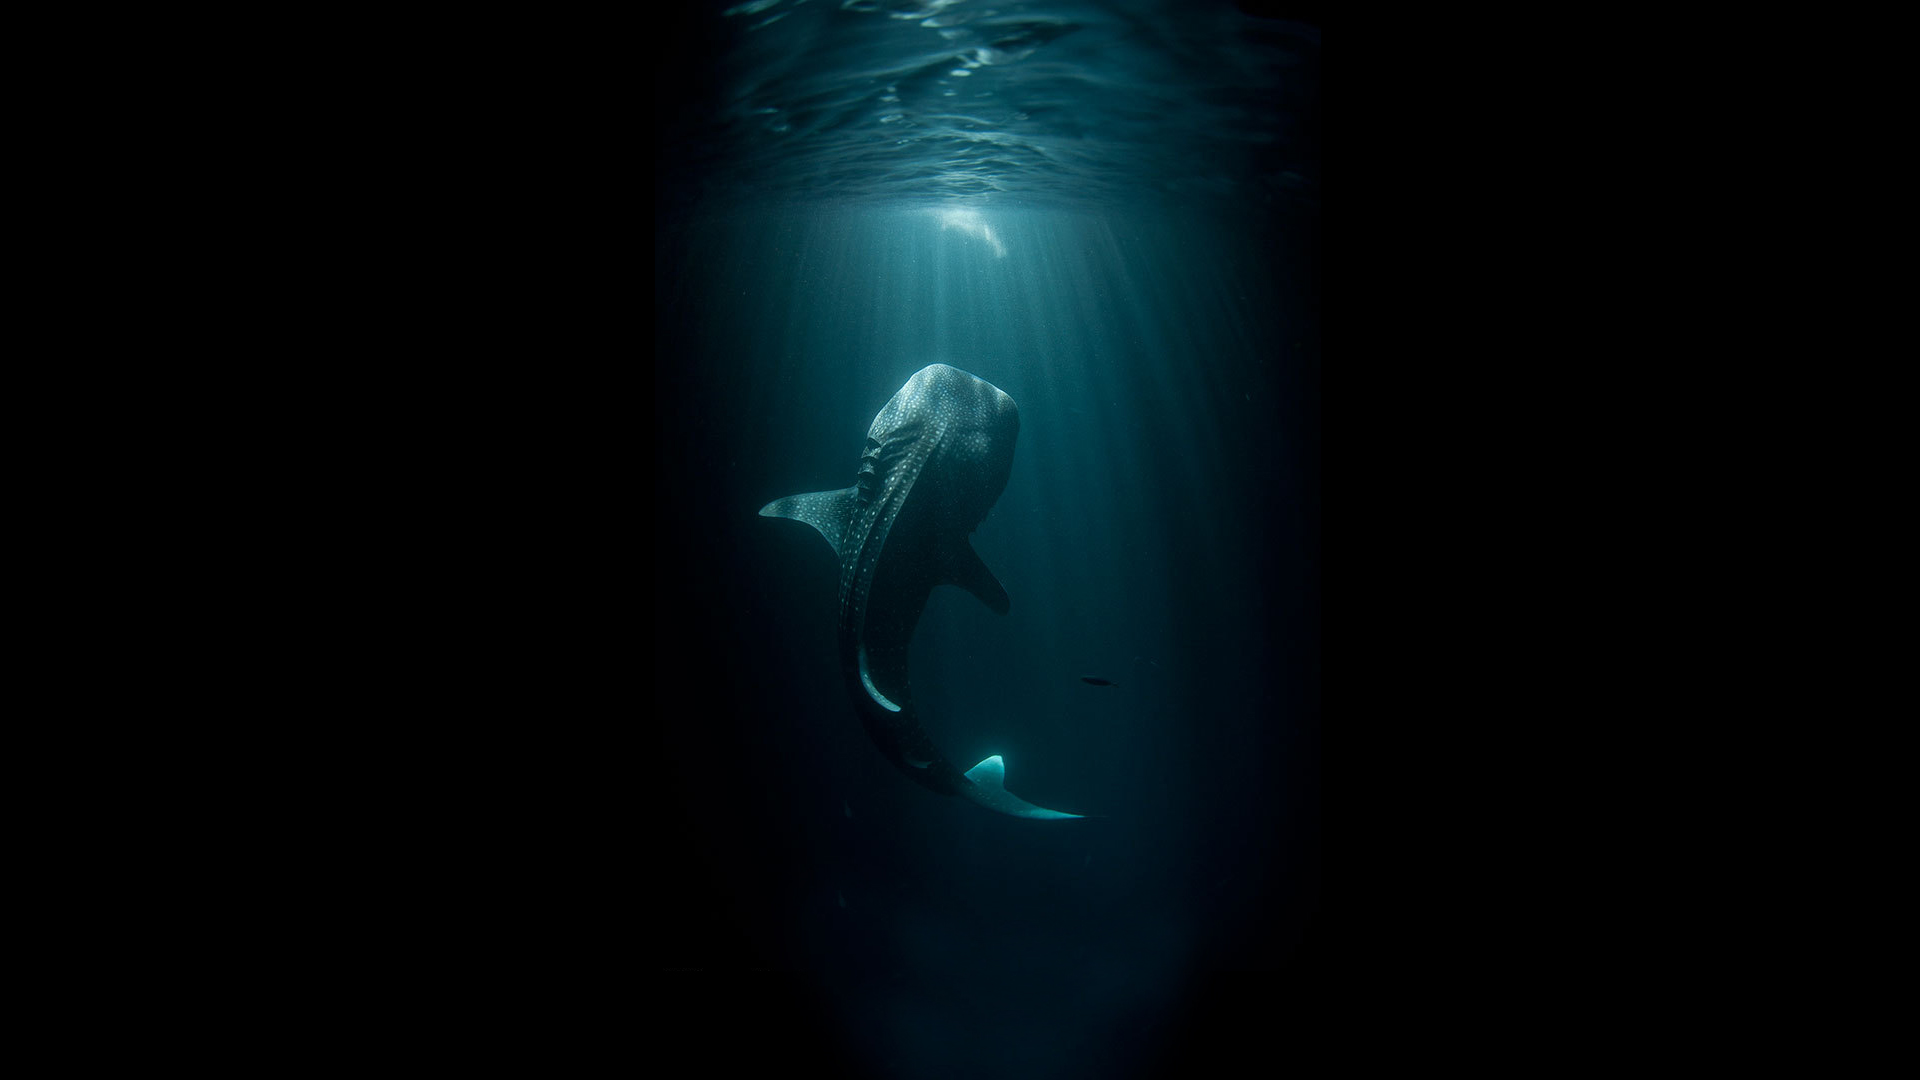 fish giant underwater ocean black shark wallpaper